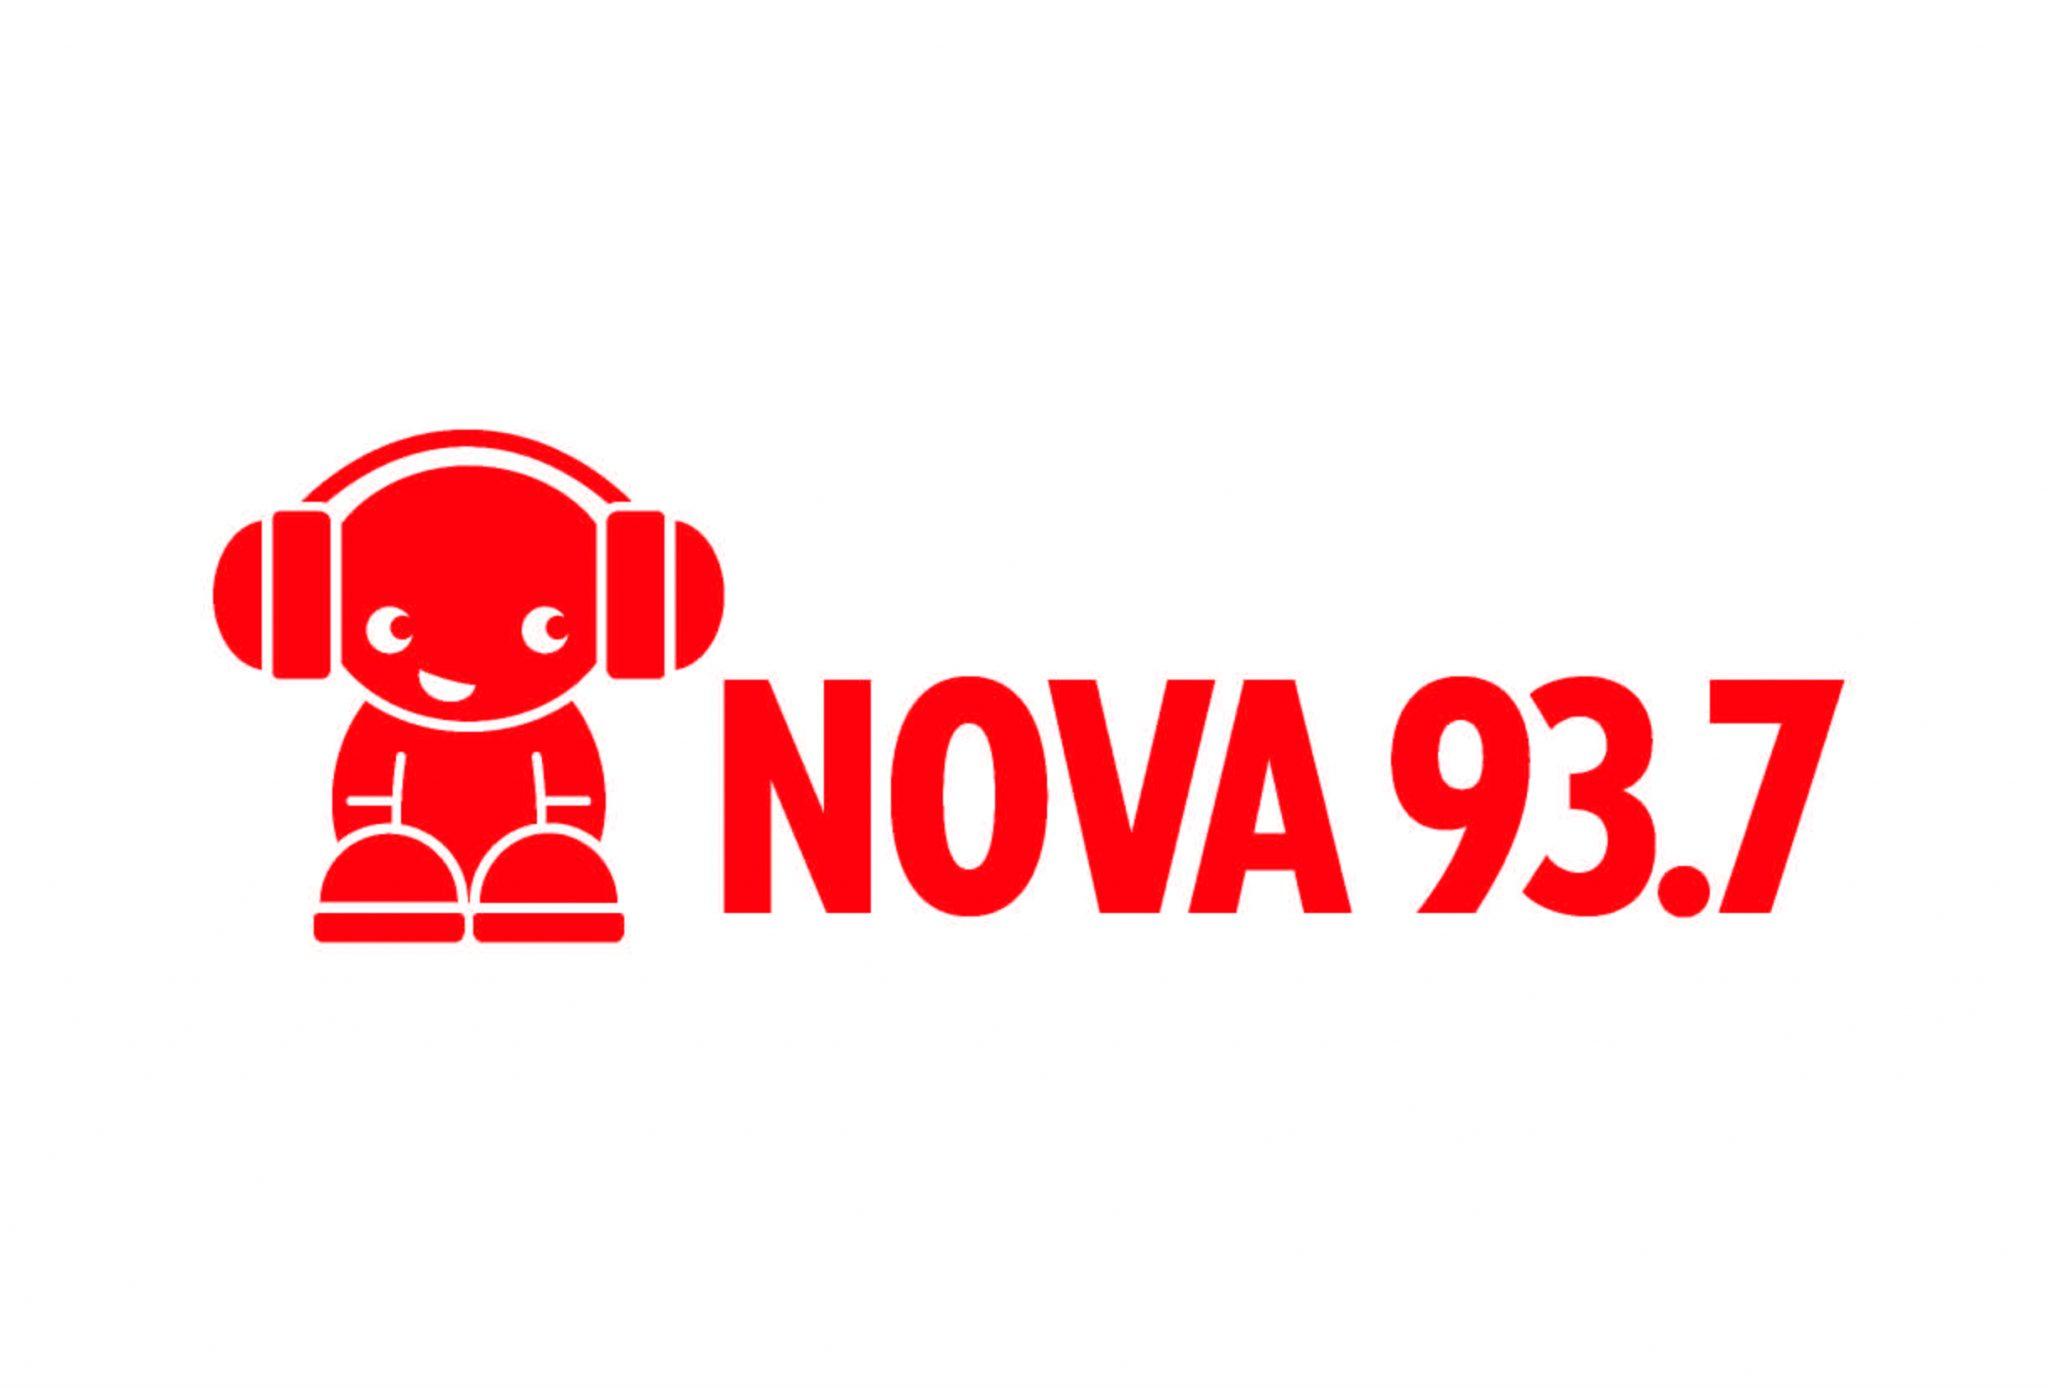 NOVA 93.7